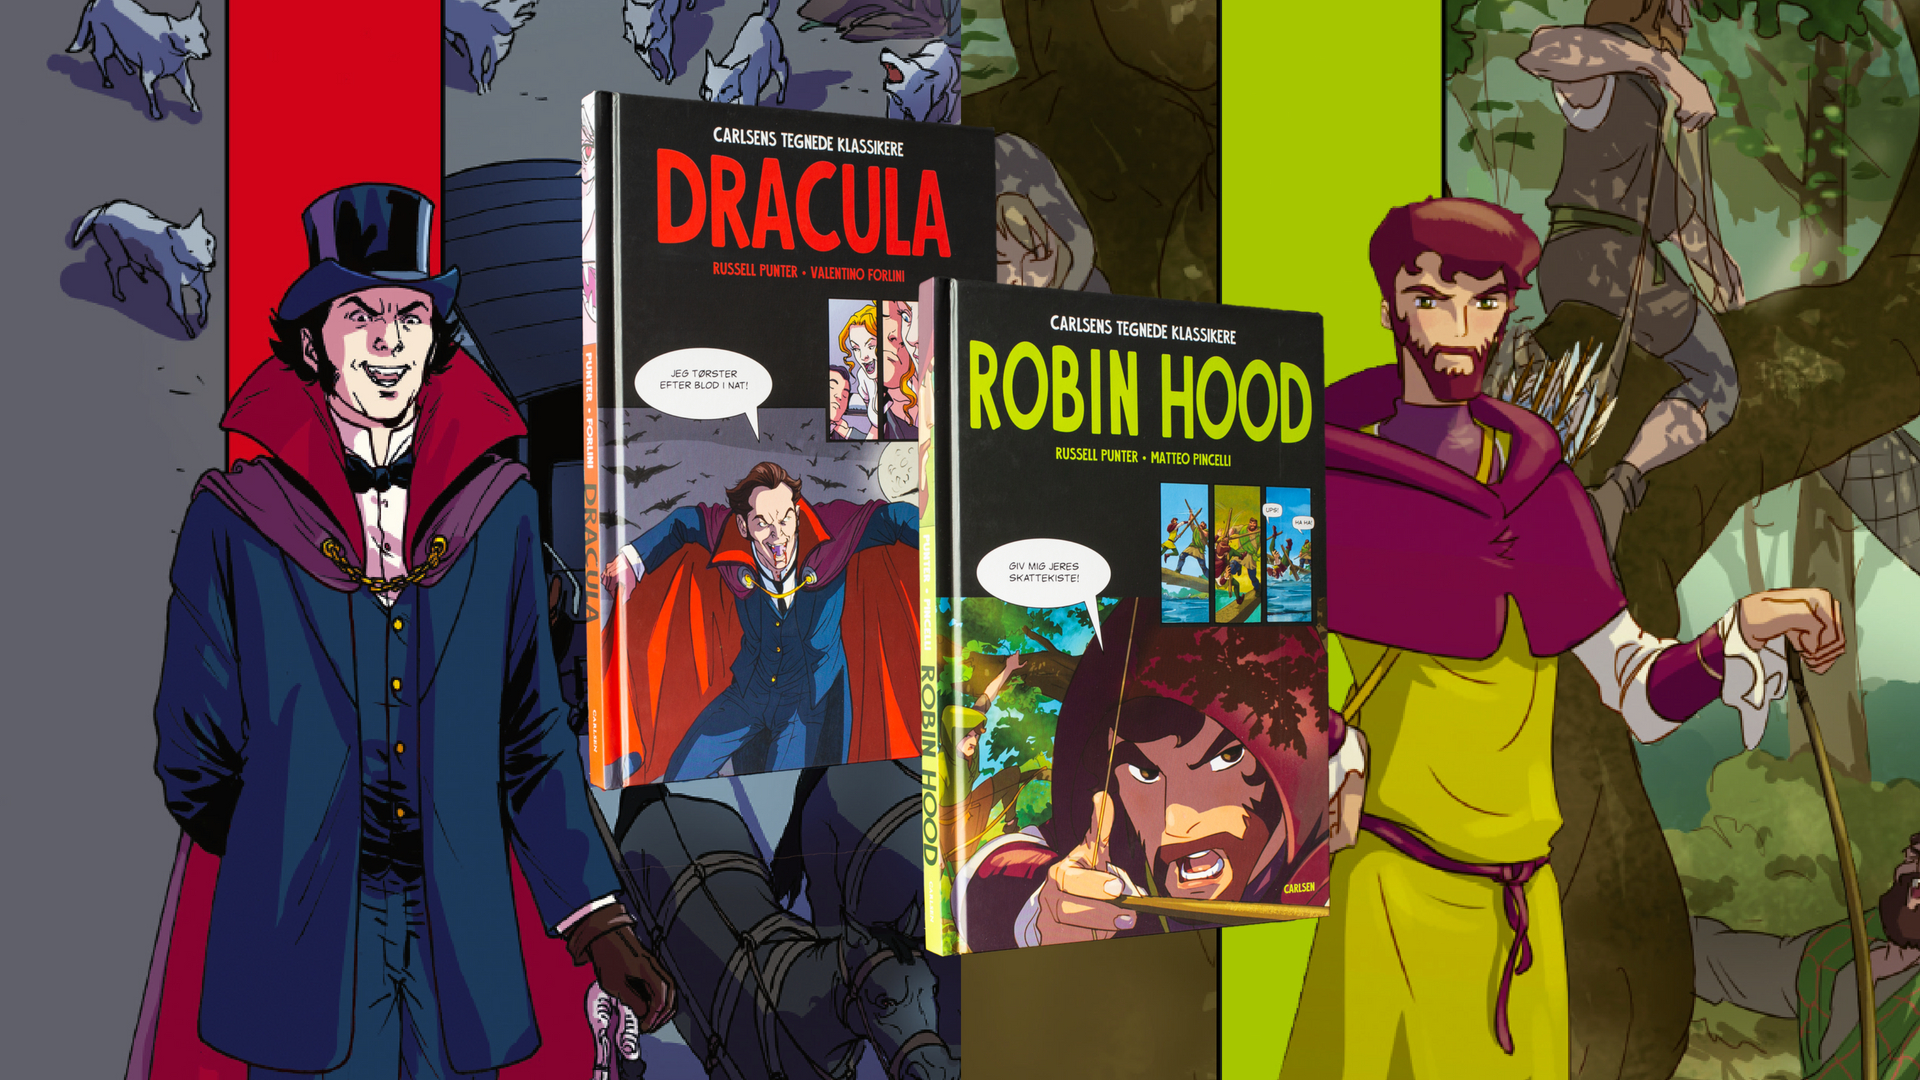 carlsens tegnede klassikere, tegneserie, tegneserier, dracula, robin hood